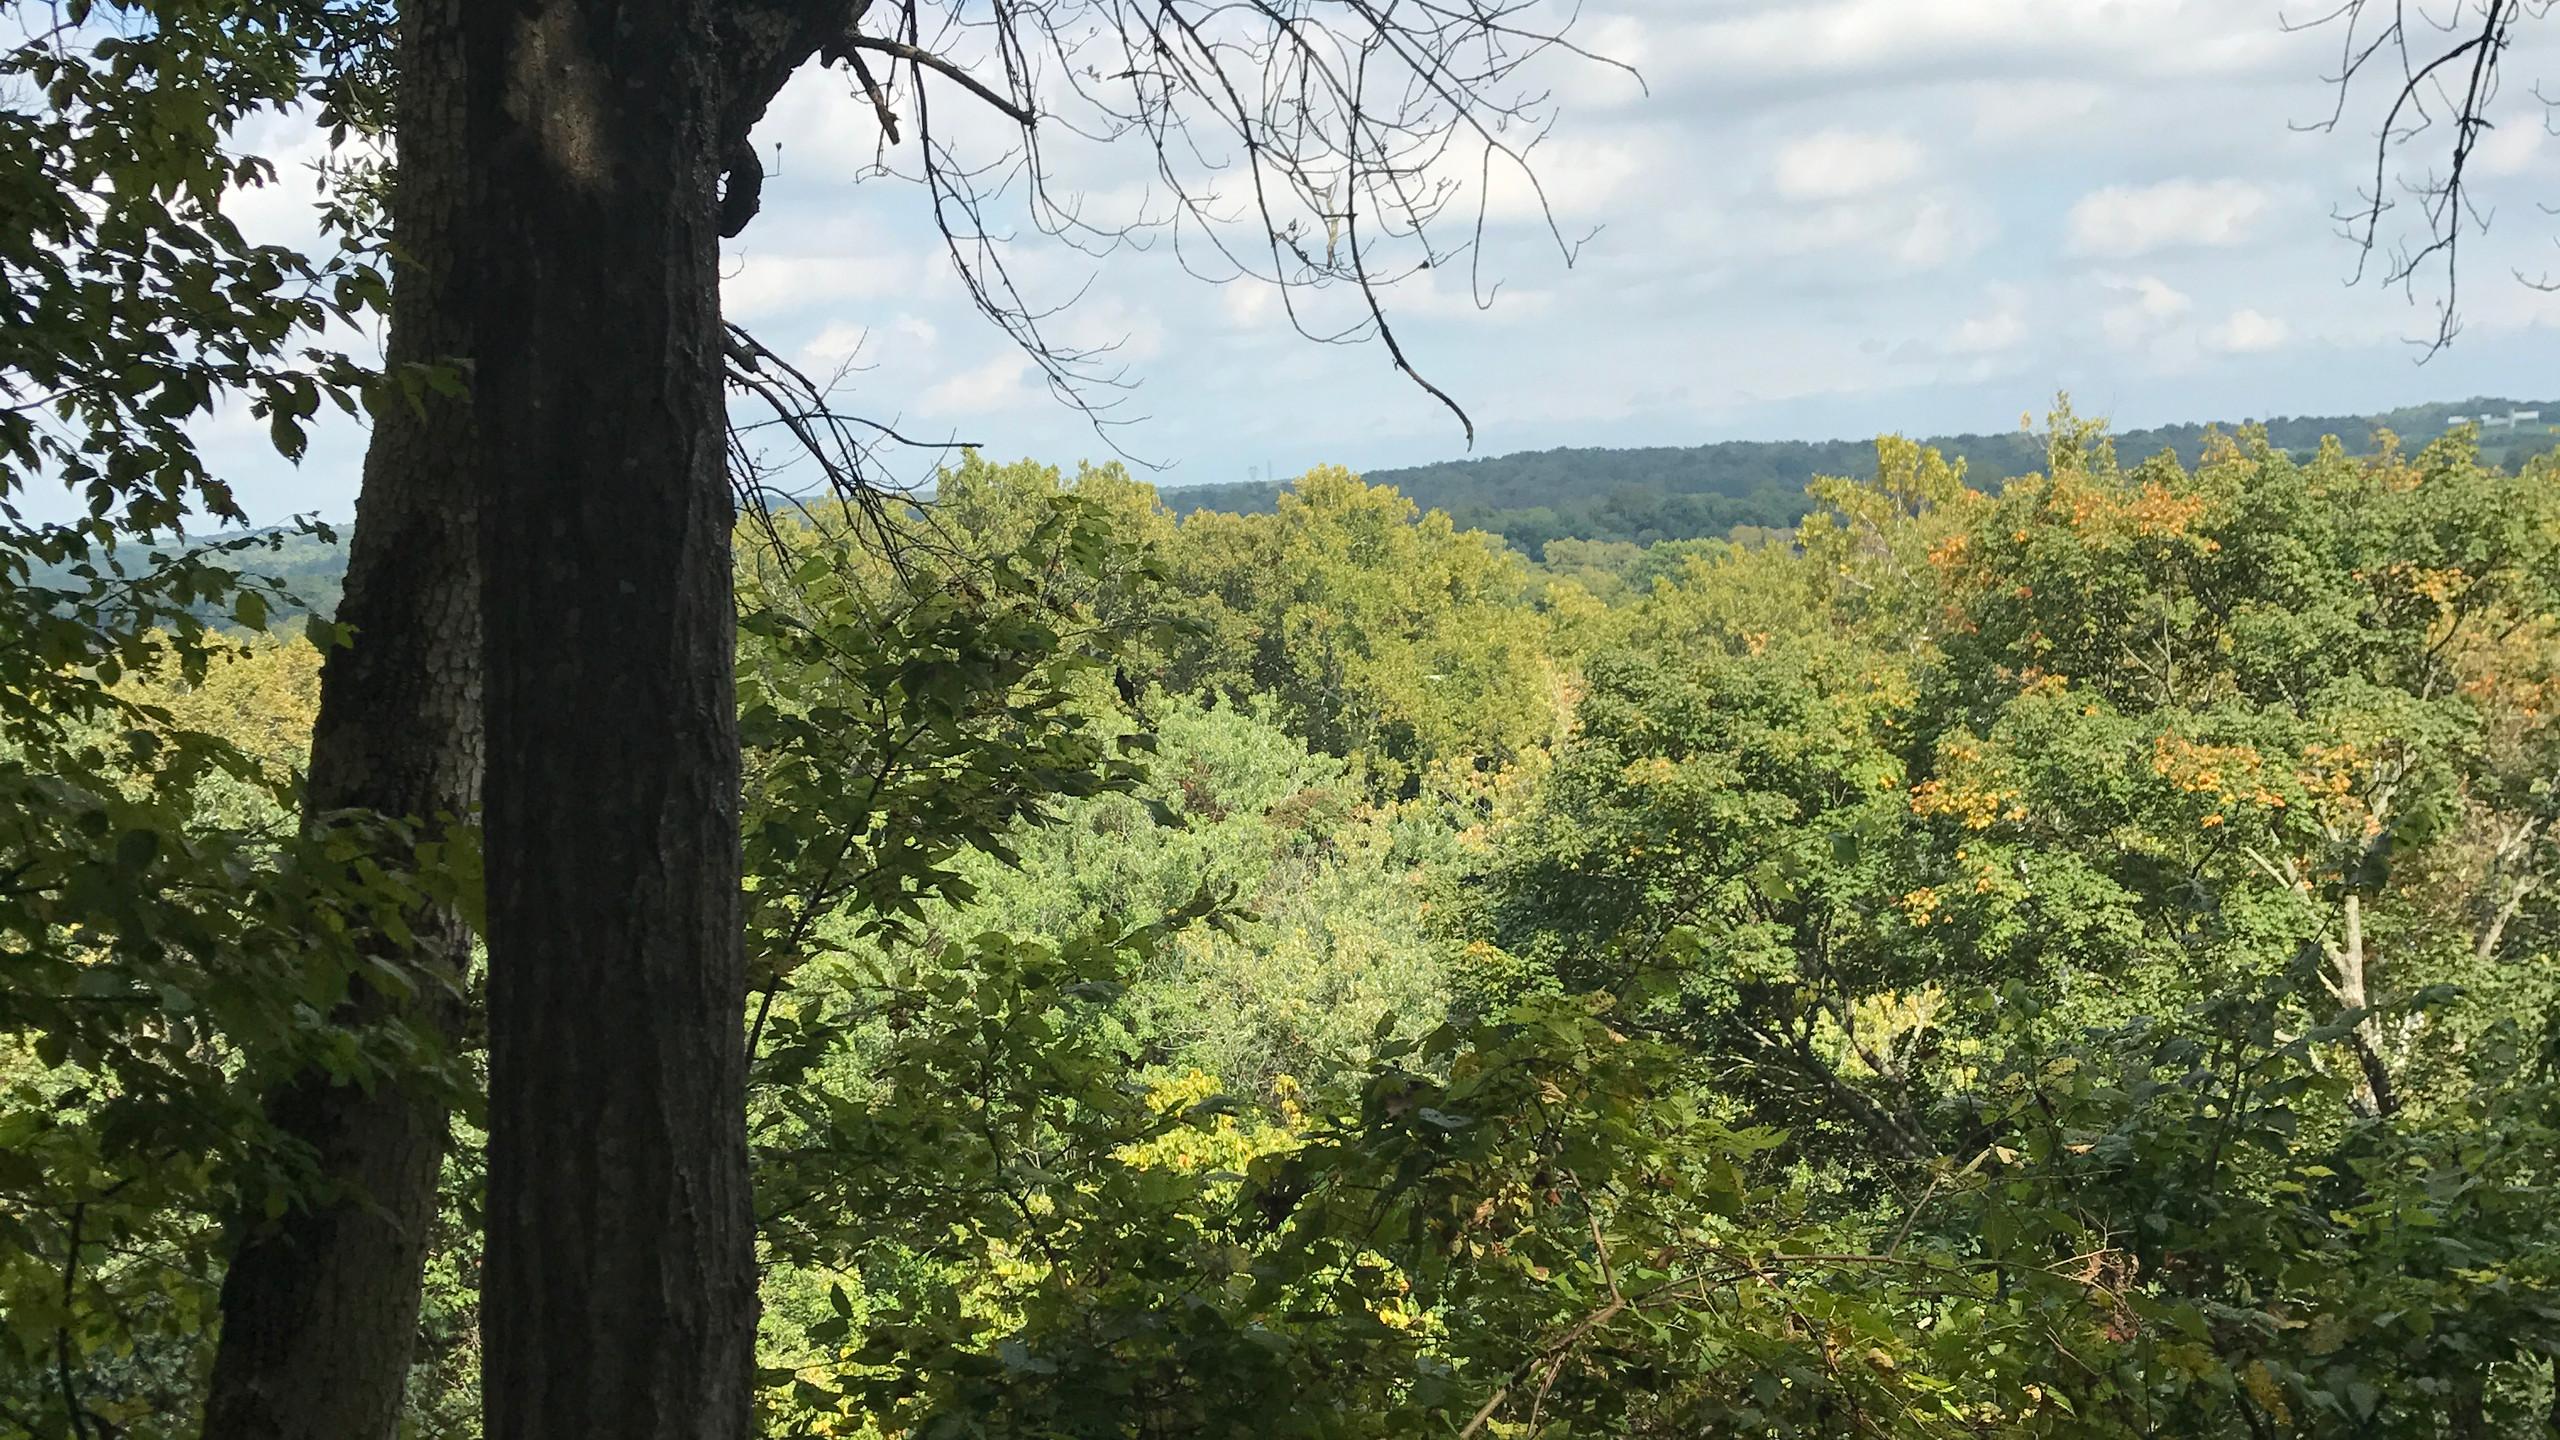 Overlook at Ball's Bluff